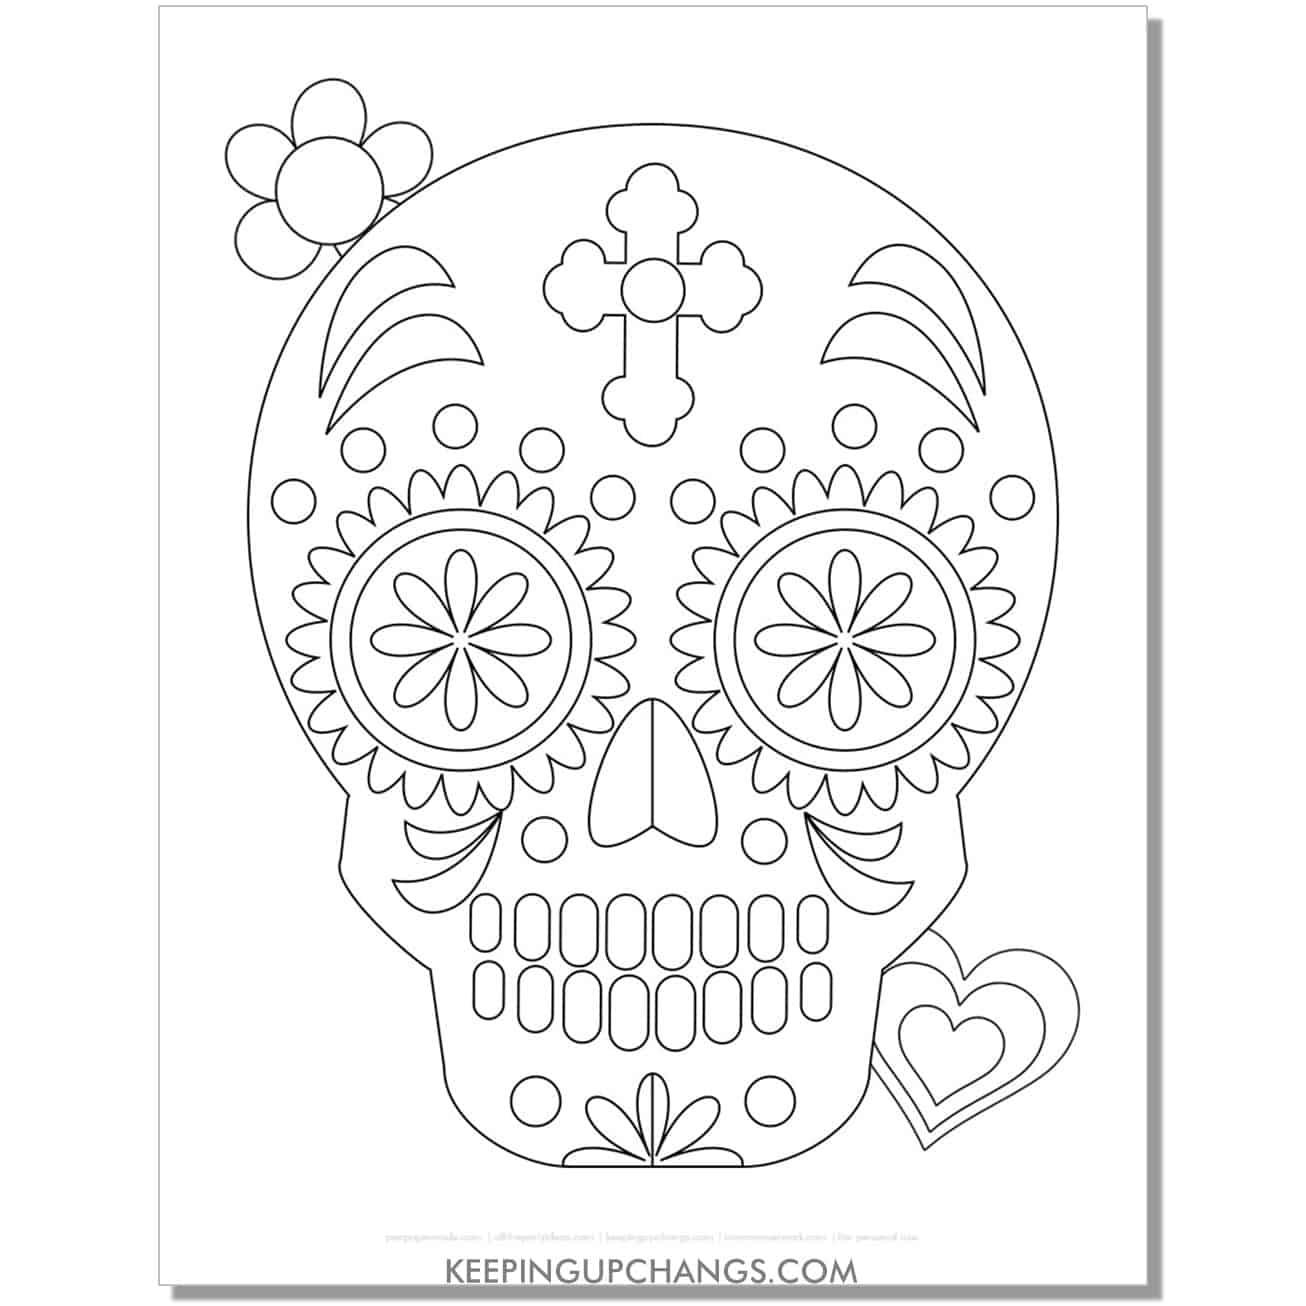 free intermediate sugar skull for kids coloring page.